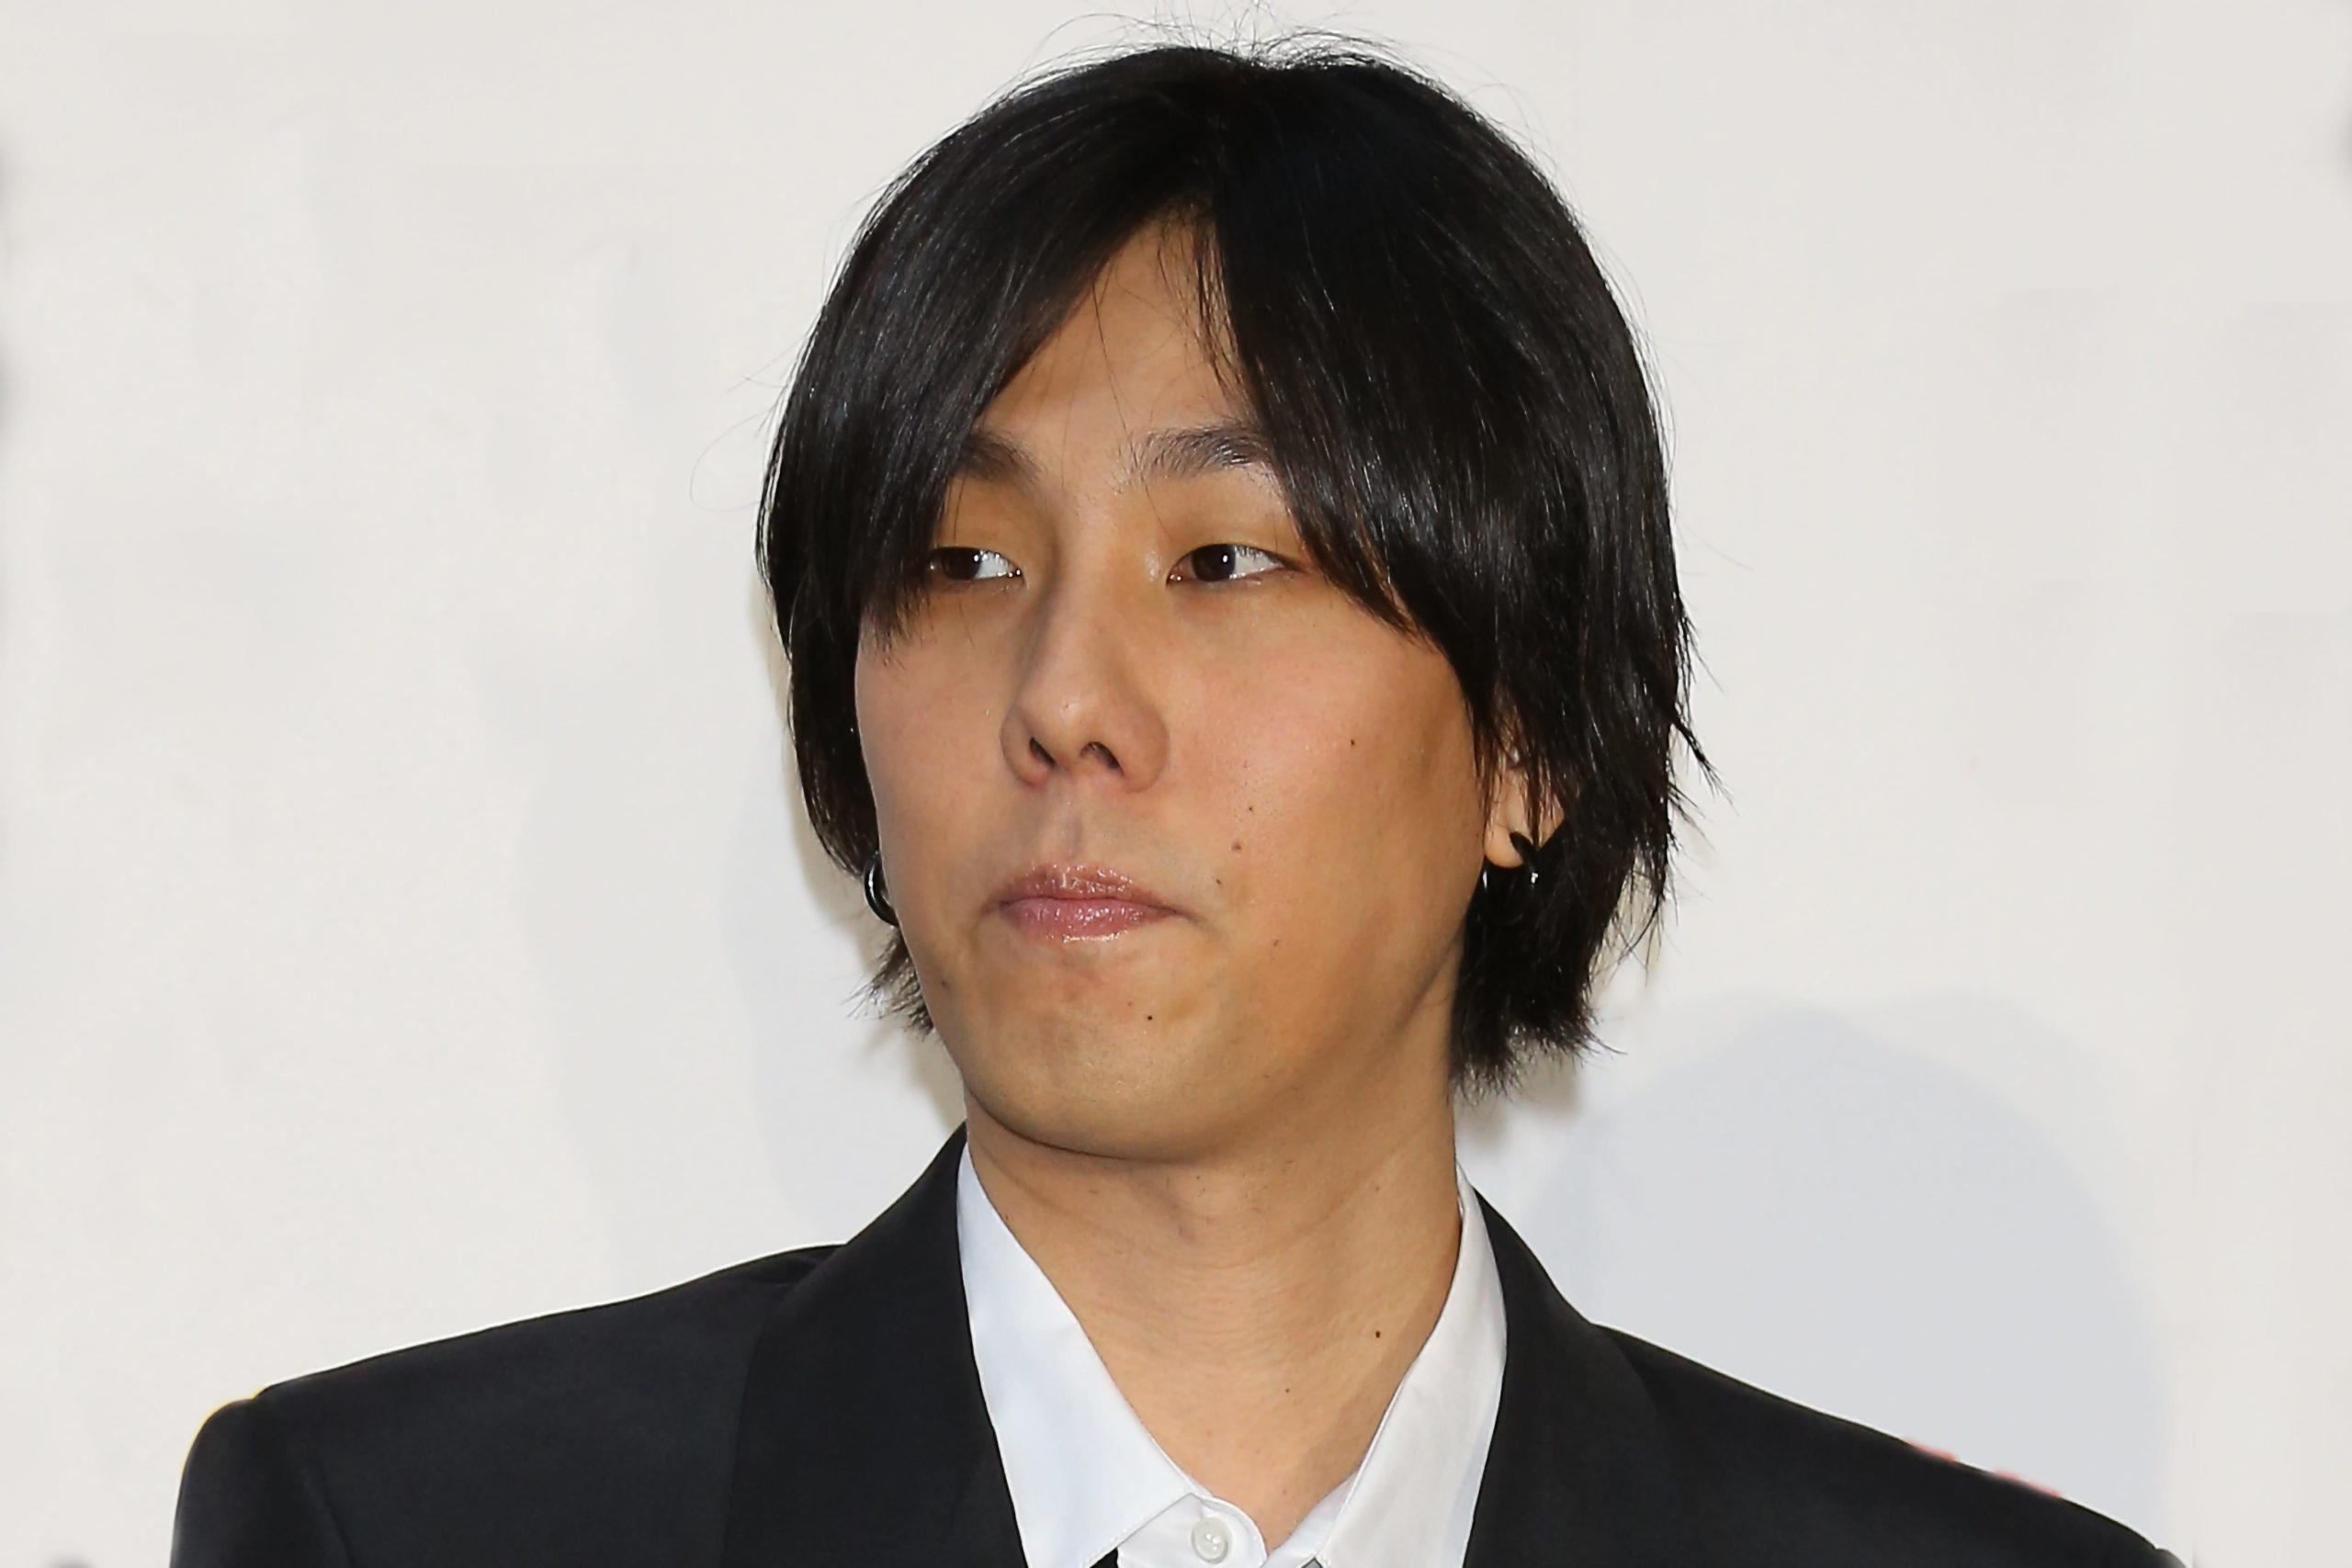 野田洋次郎・RADWIMPS